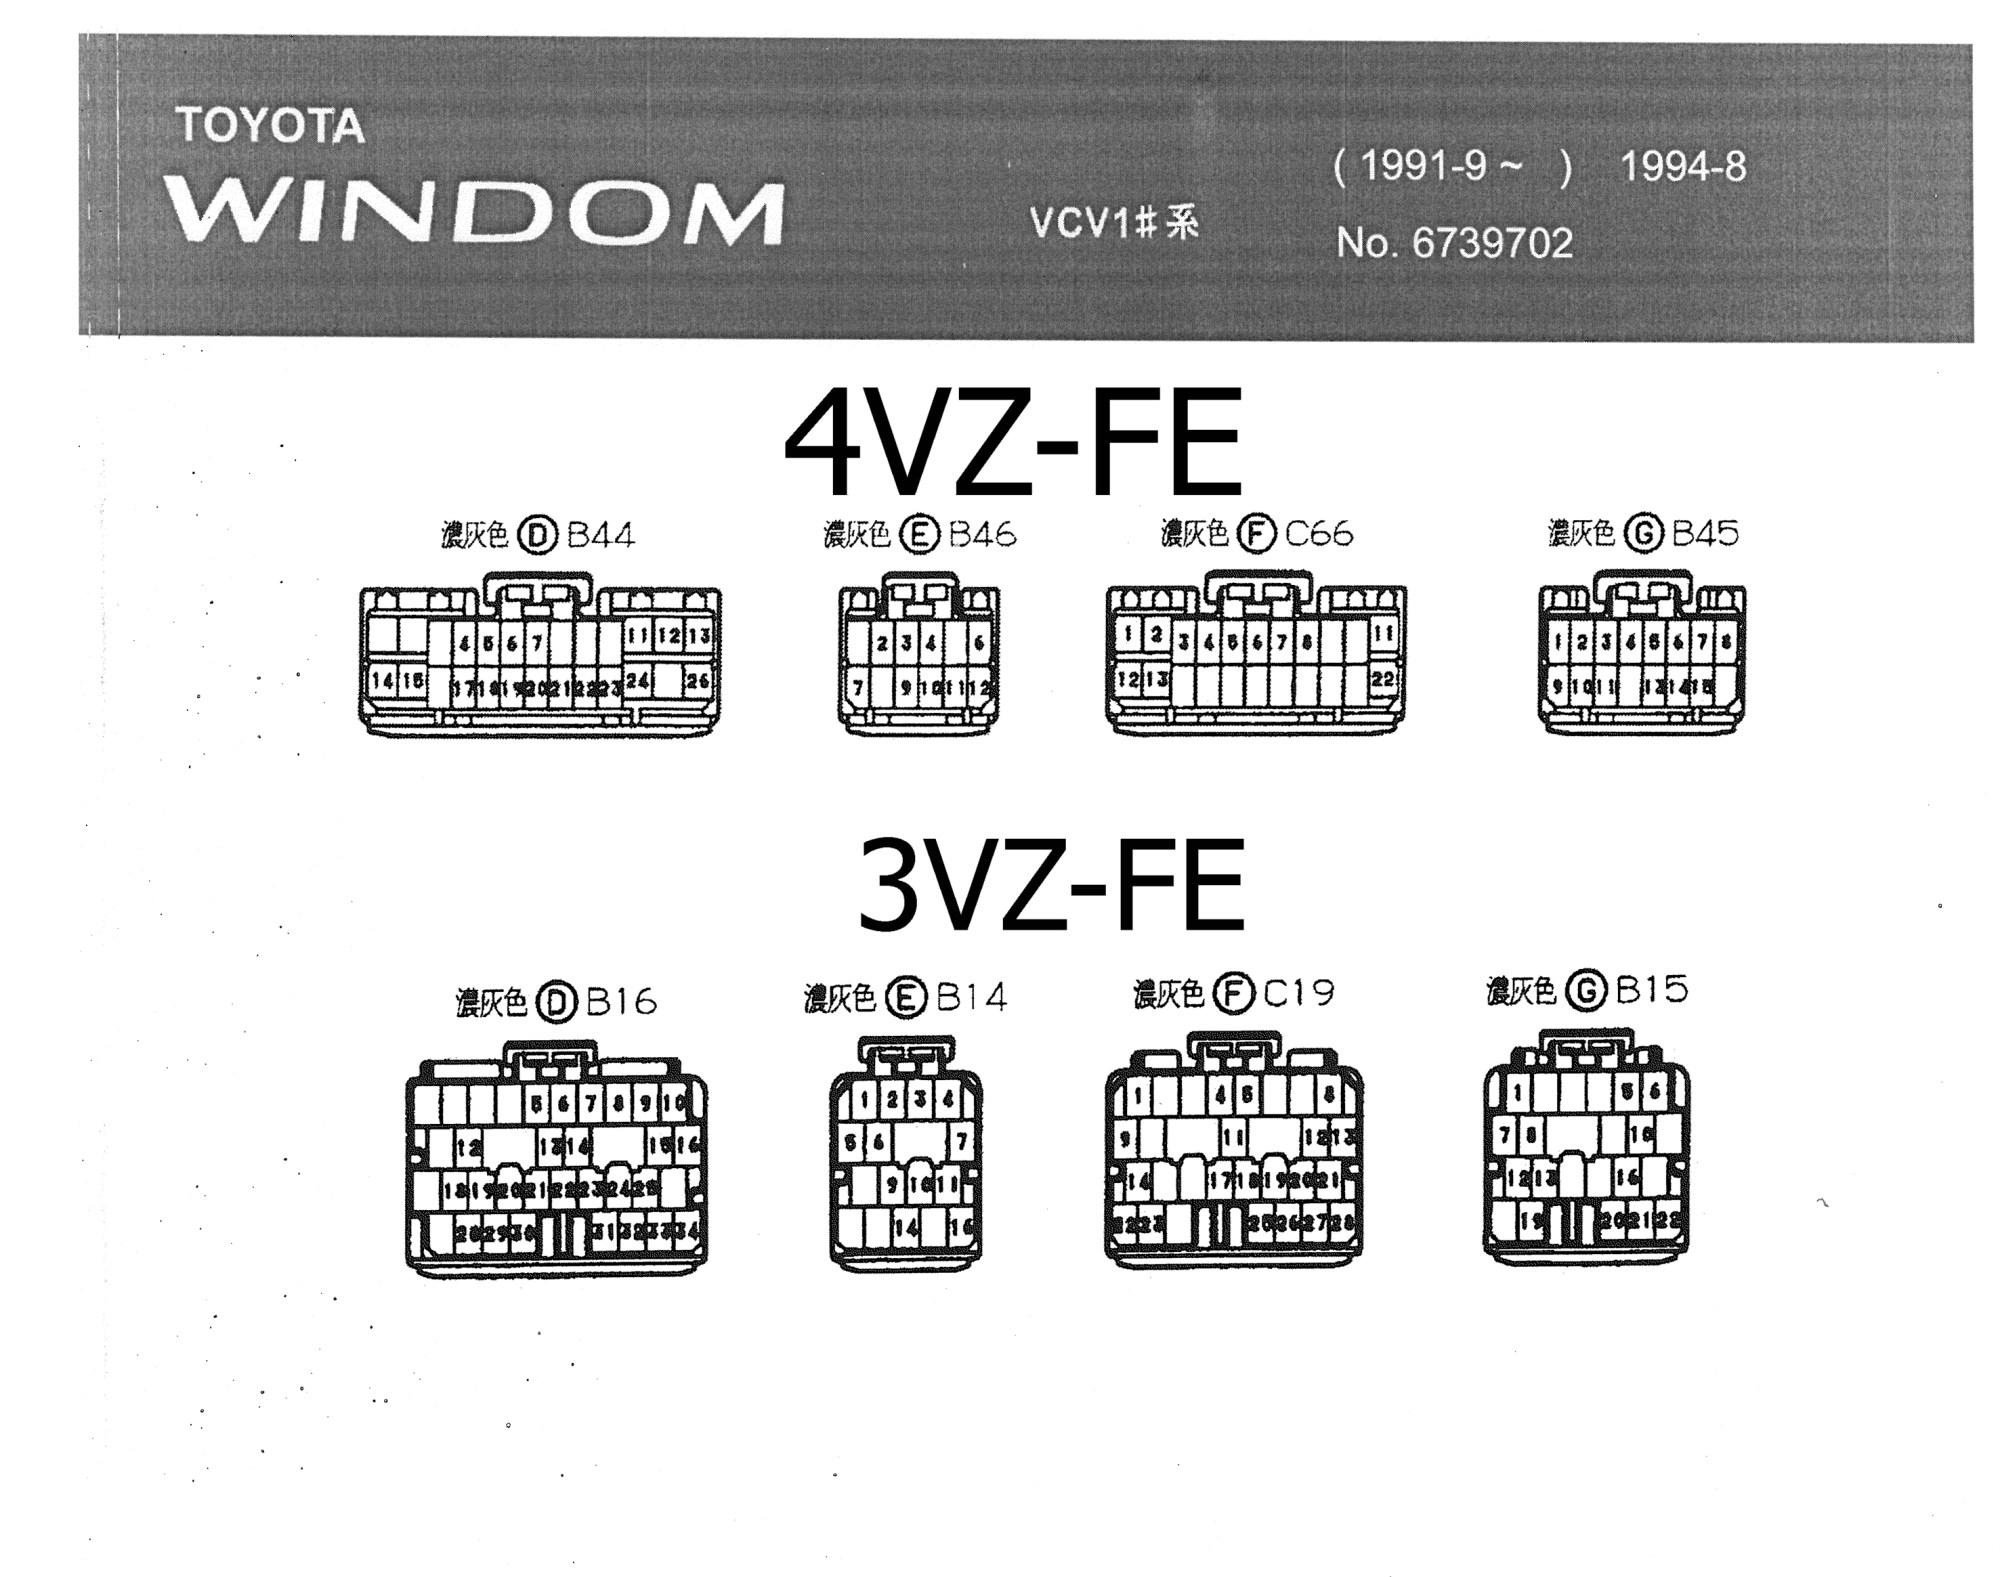 hight resolution of  wiring diagram toyota windom 1991 9 1994 8 tk toyota power window wiring diagram toyota windom wiring diagram